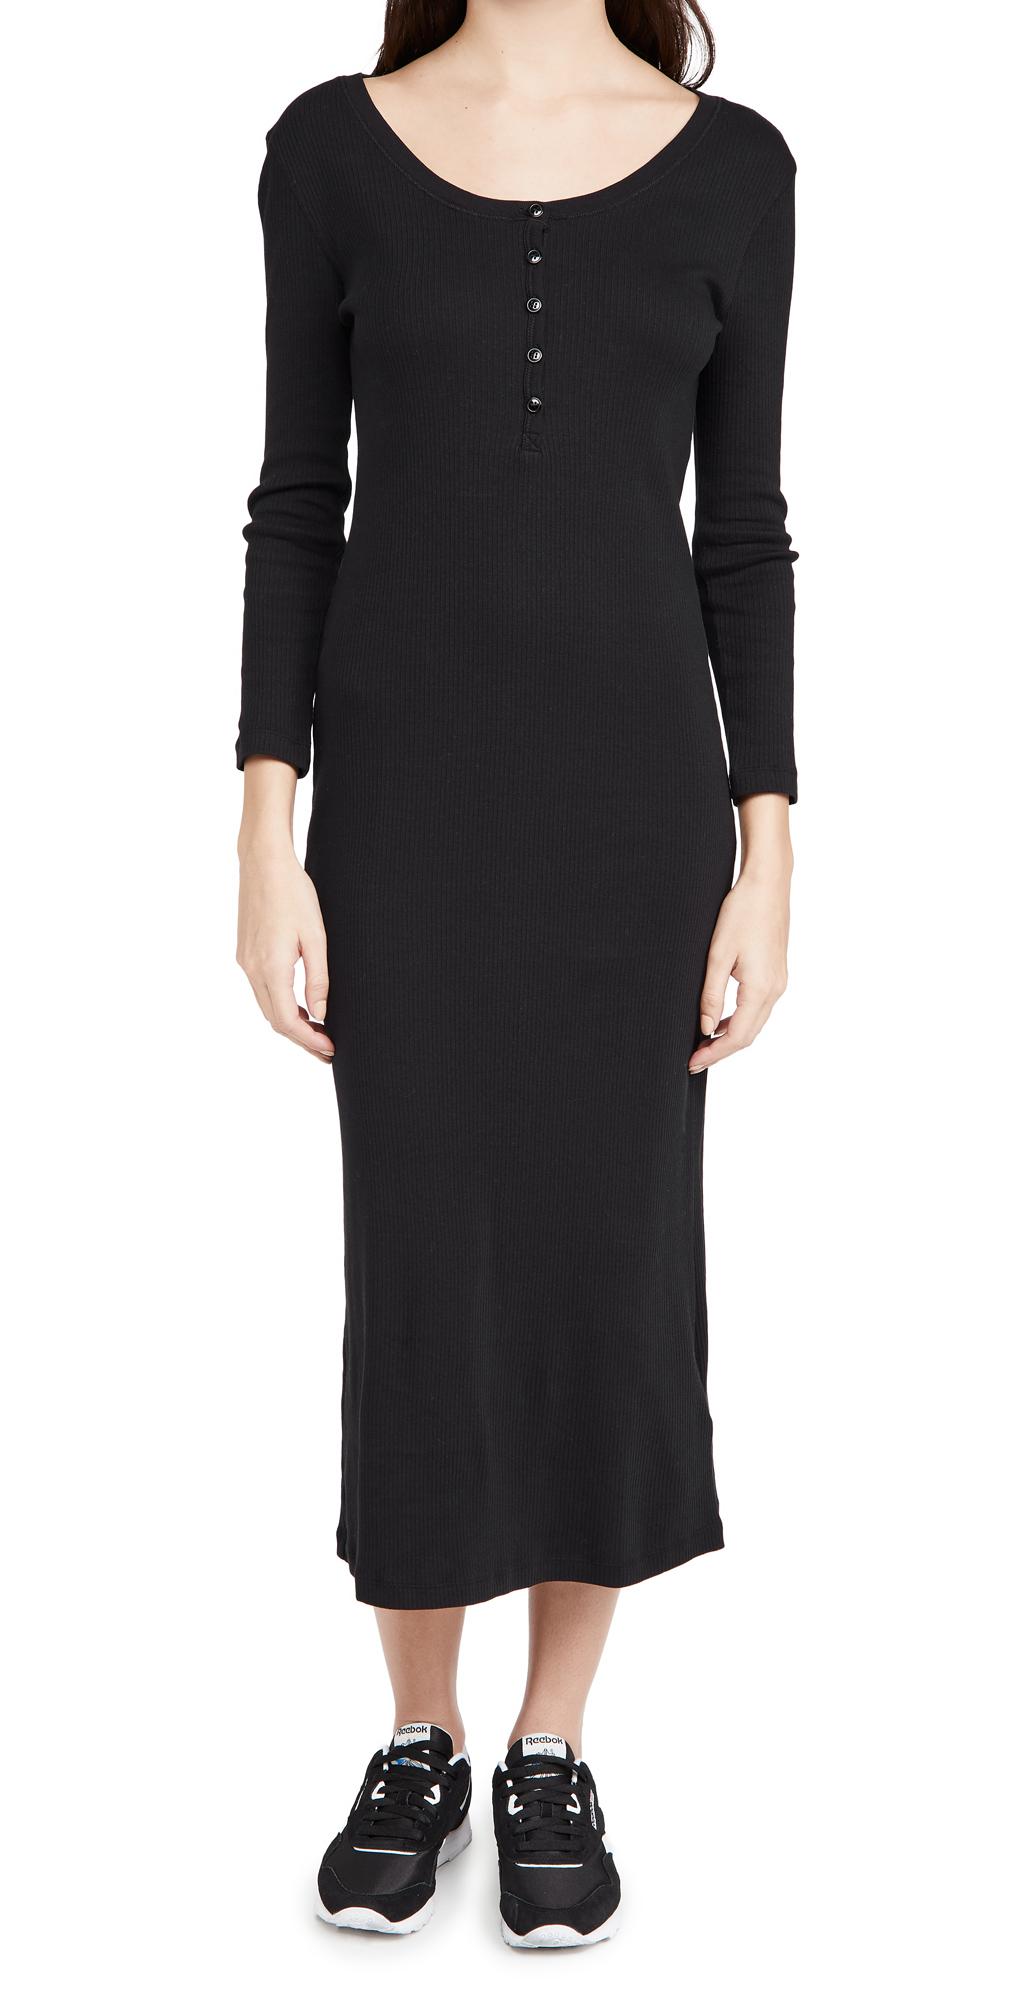 Ba & sh Taylor Dress